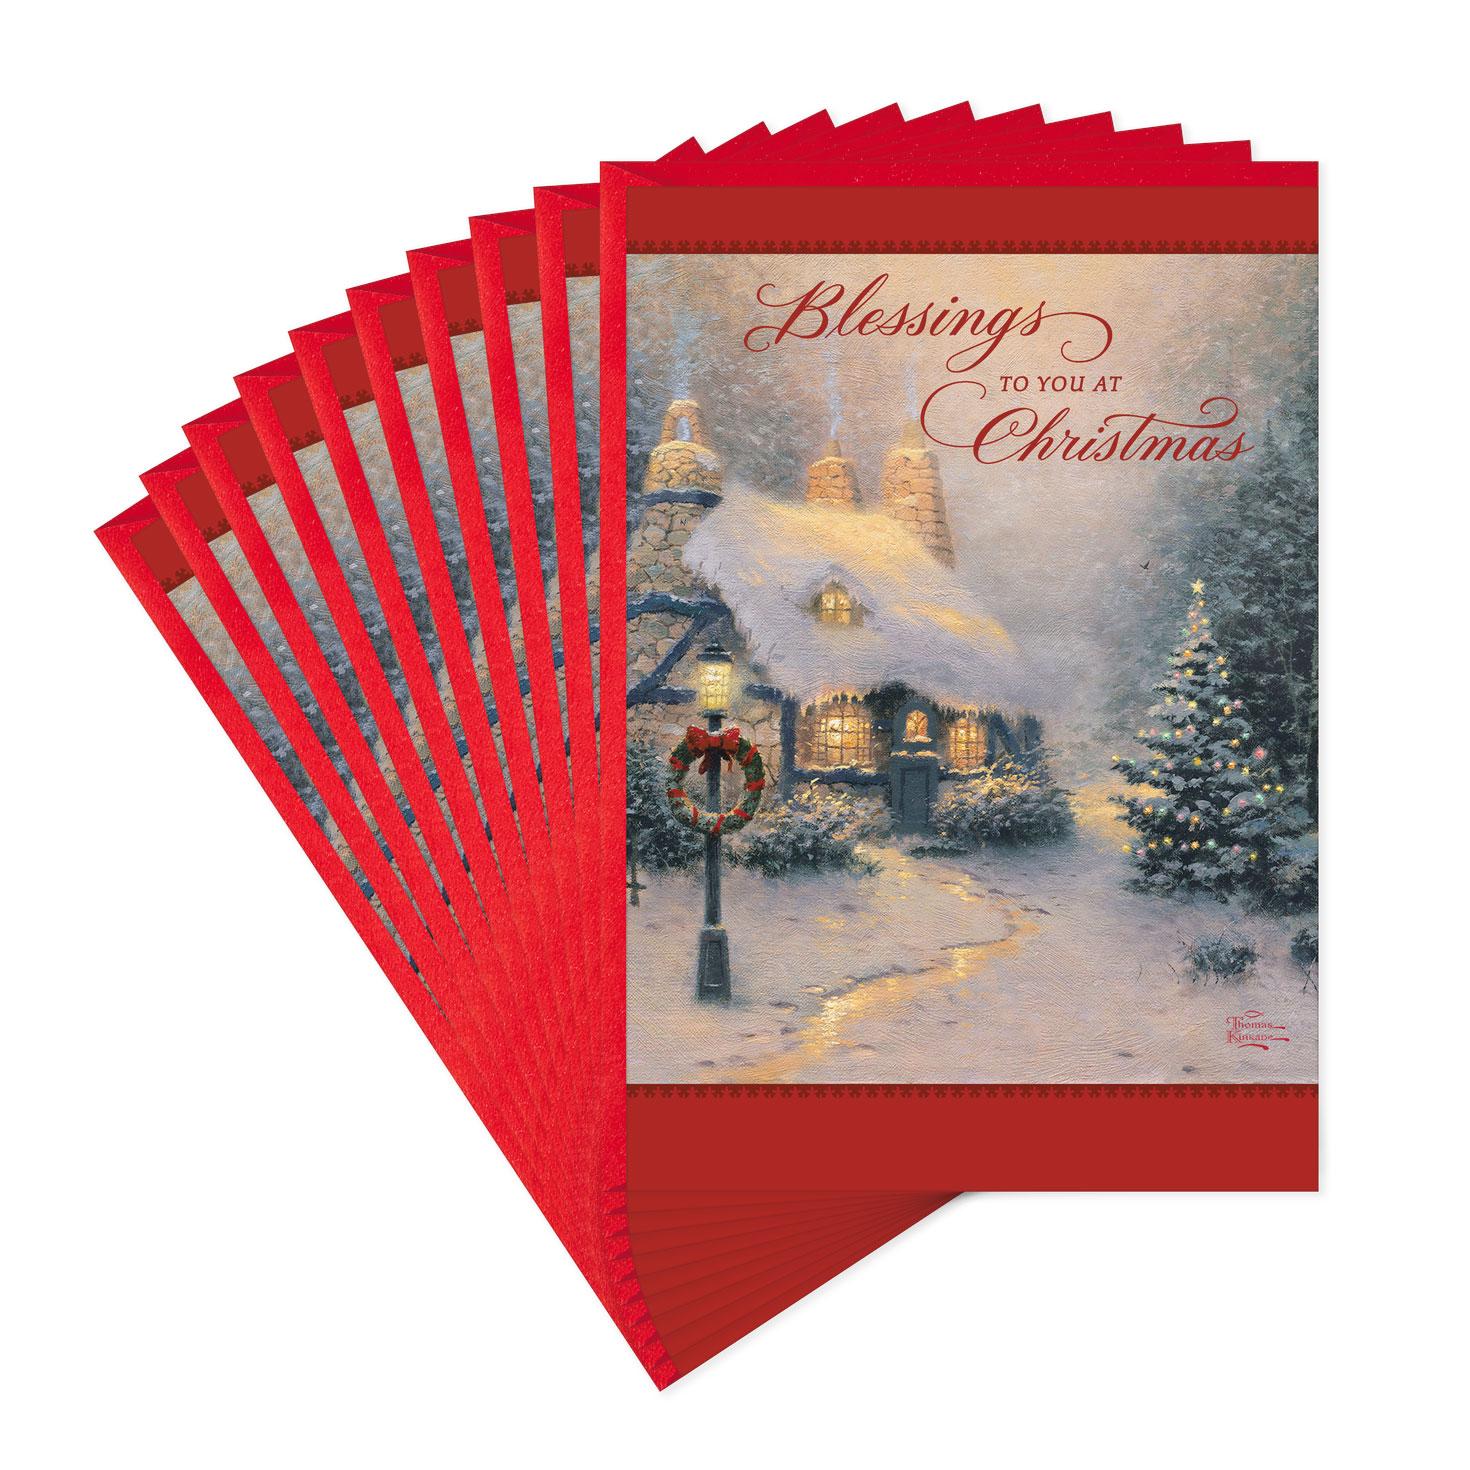 Thomas Kinkade Christmas Cards Pack Of 10 Boxed Cards Hallmark